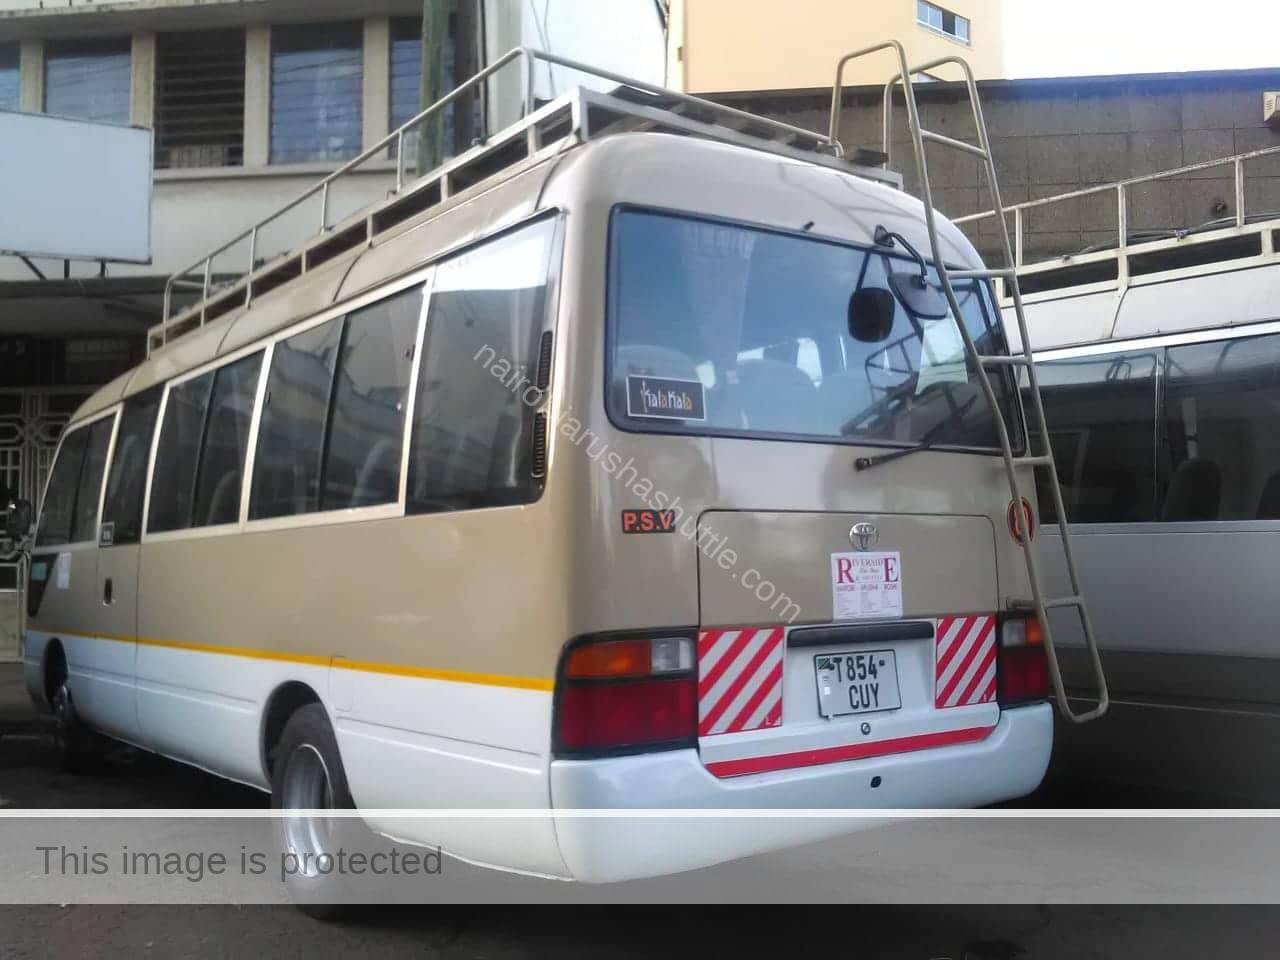 Book a seat to Arusha and Moshi Tanzania